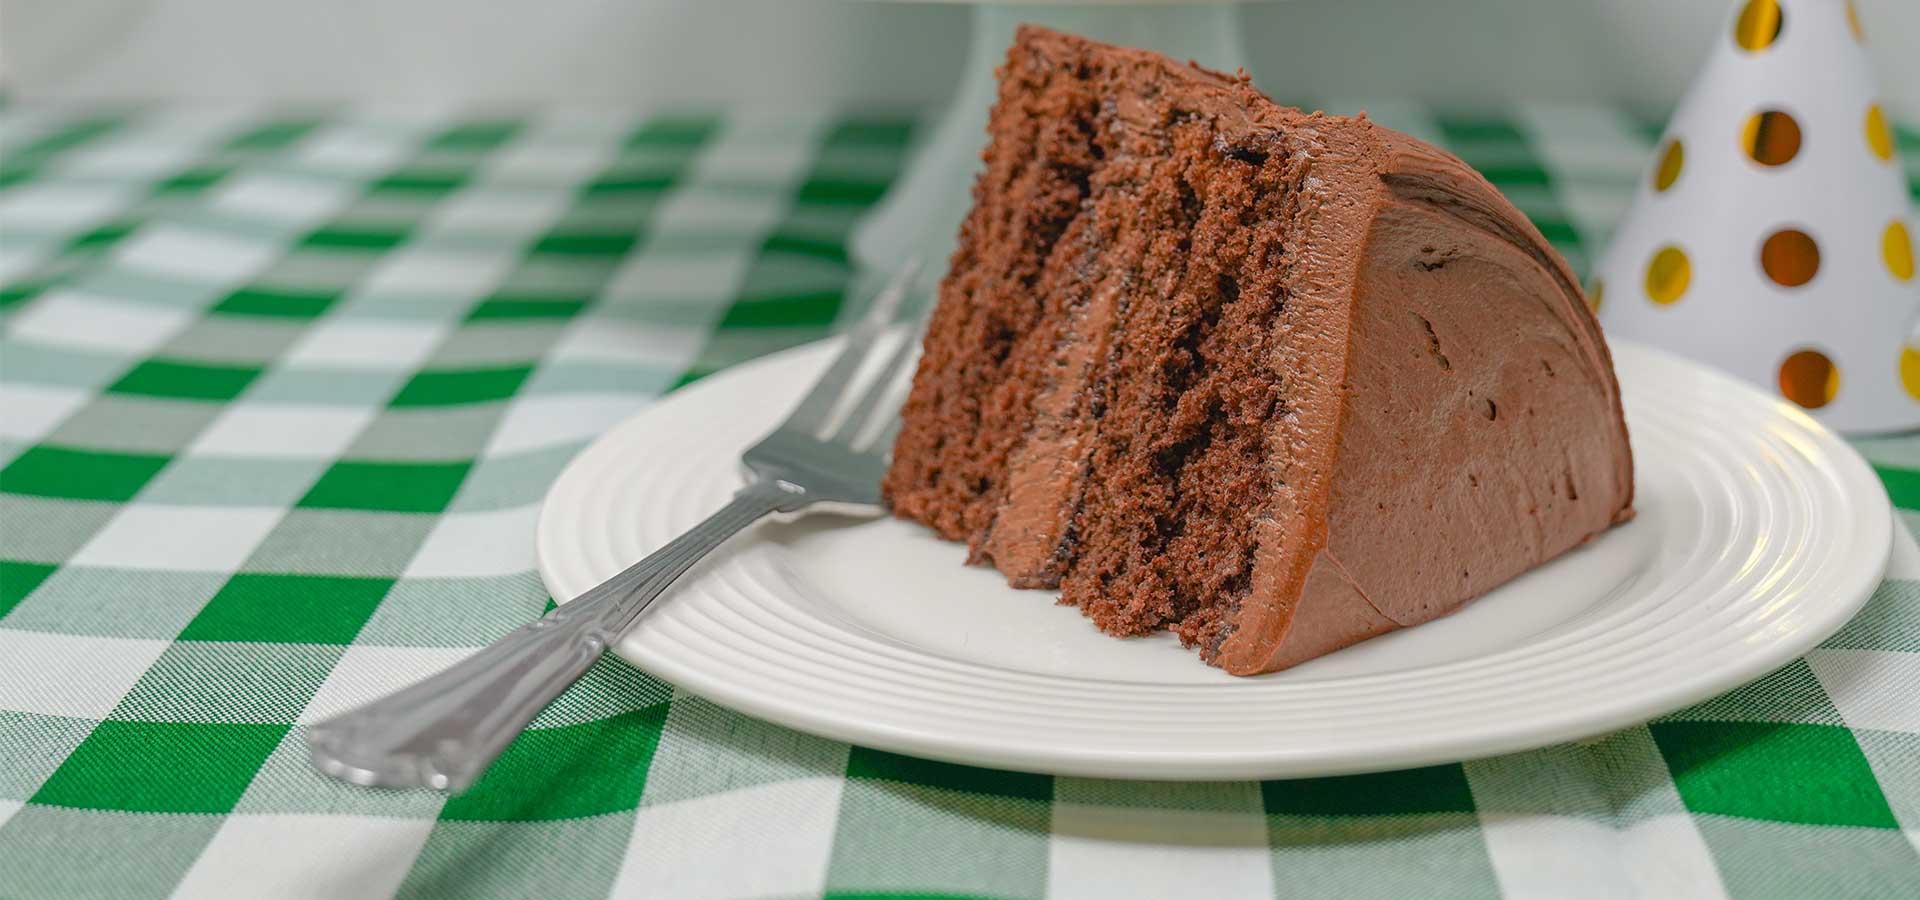 Bill Knapp's Chocolate Cake